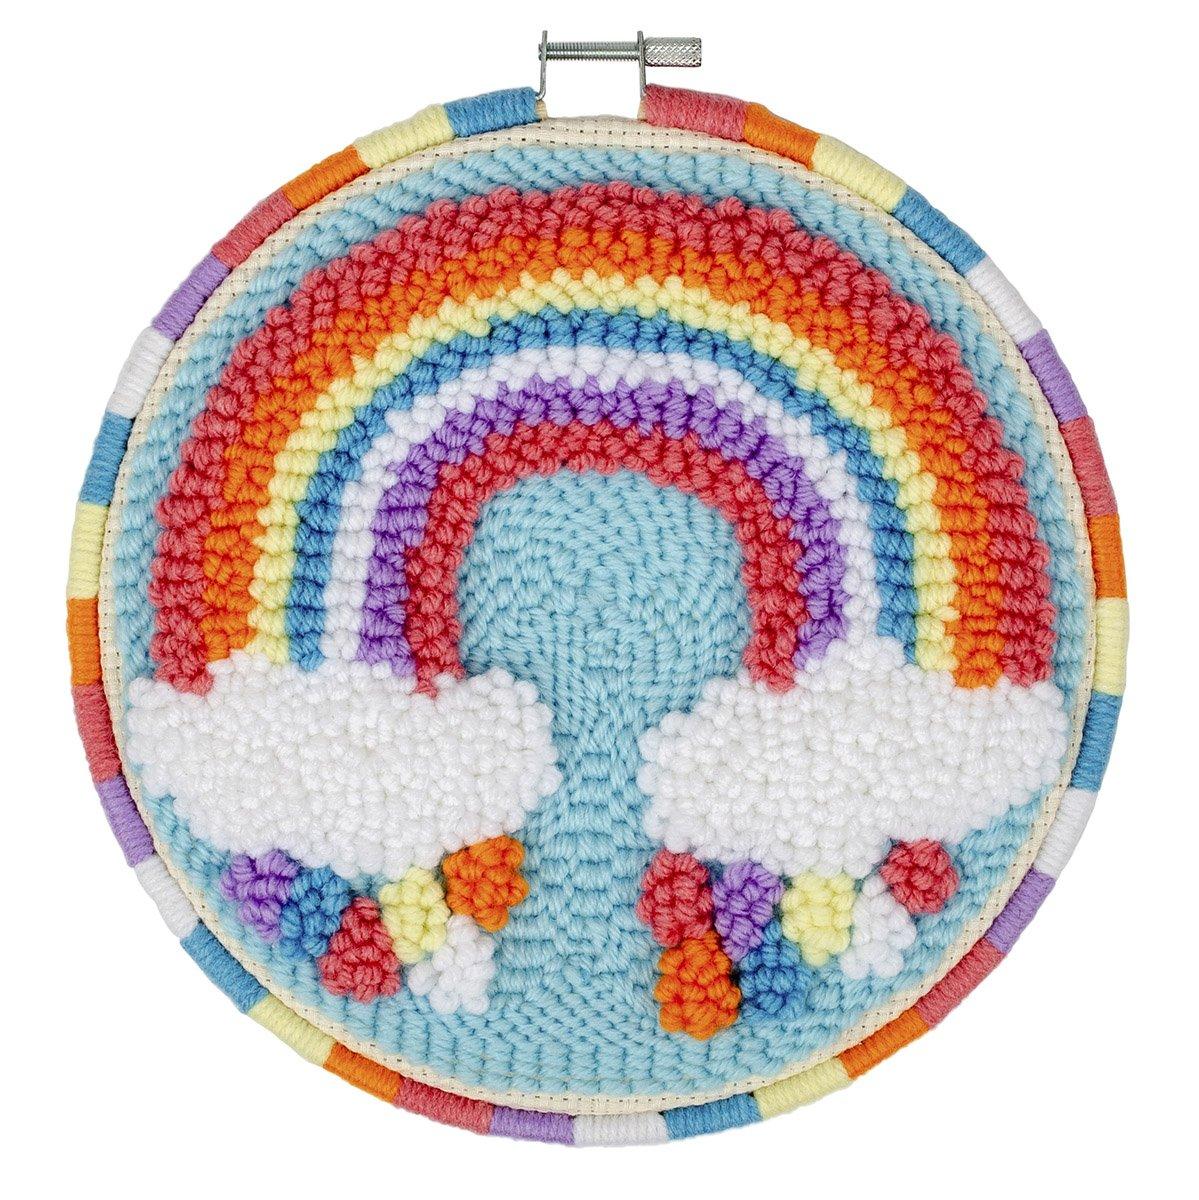 Needle Creations<br>8 Punch Needle Hoop Rainbow<br>NC-PNND-RNBOW8